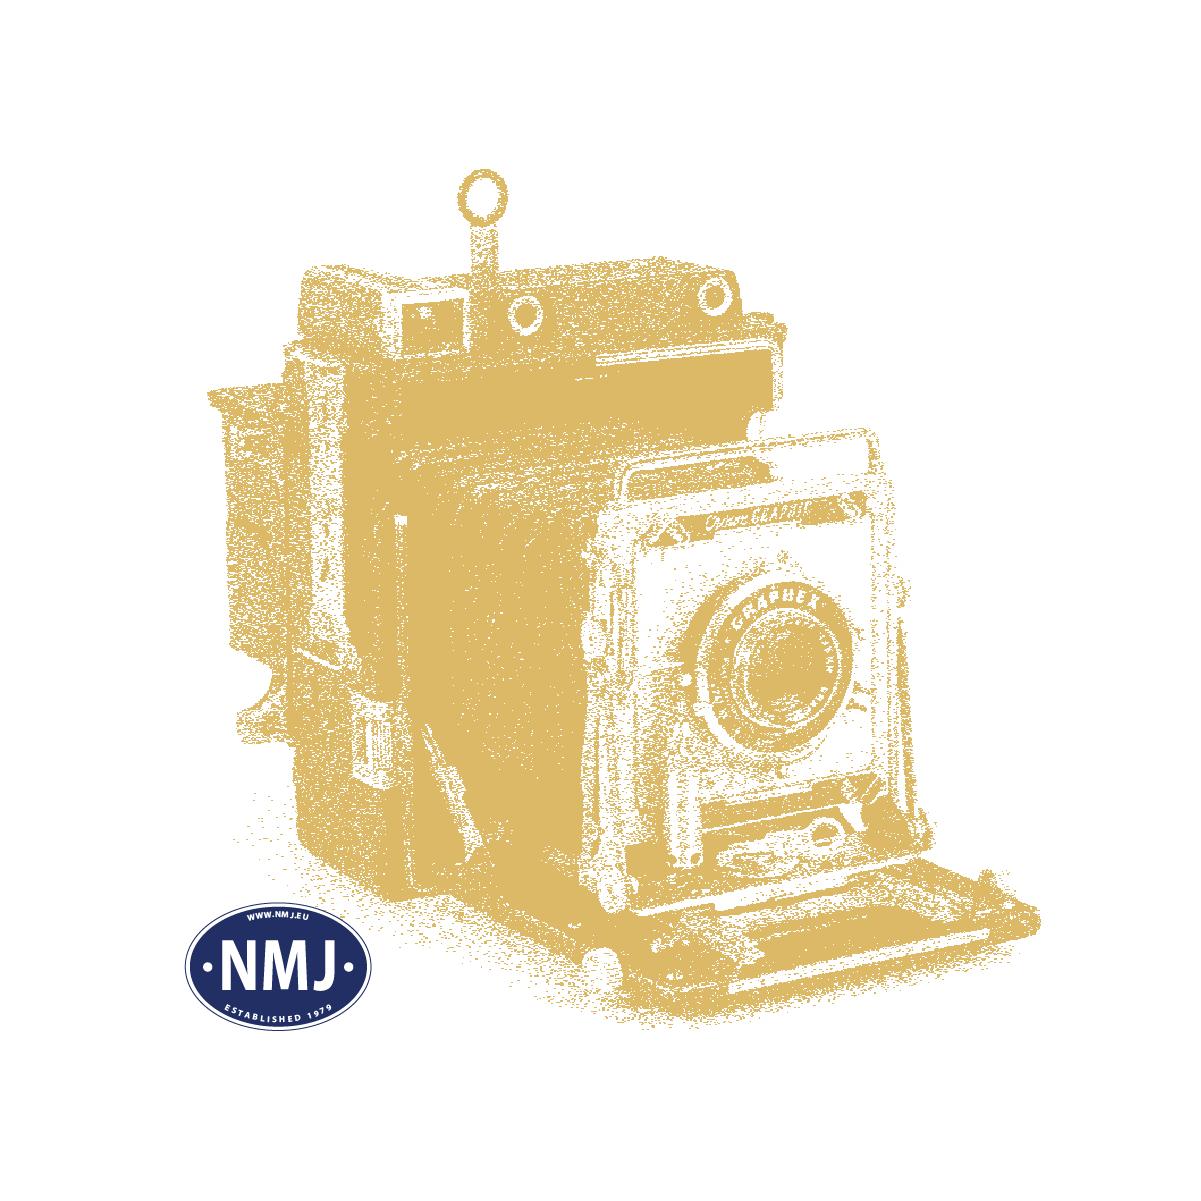 NOC14632 - LC minis Kanaldeckel+Gullys